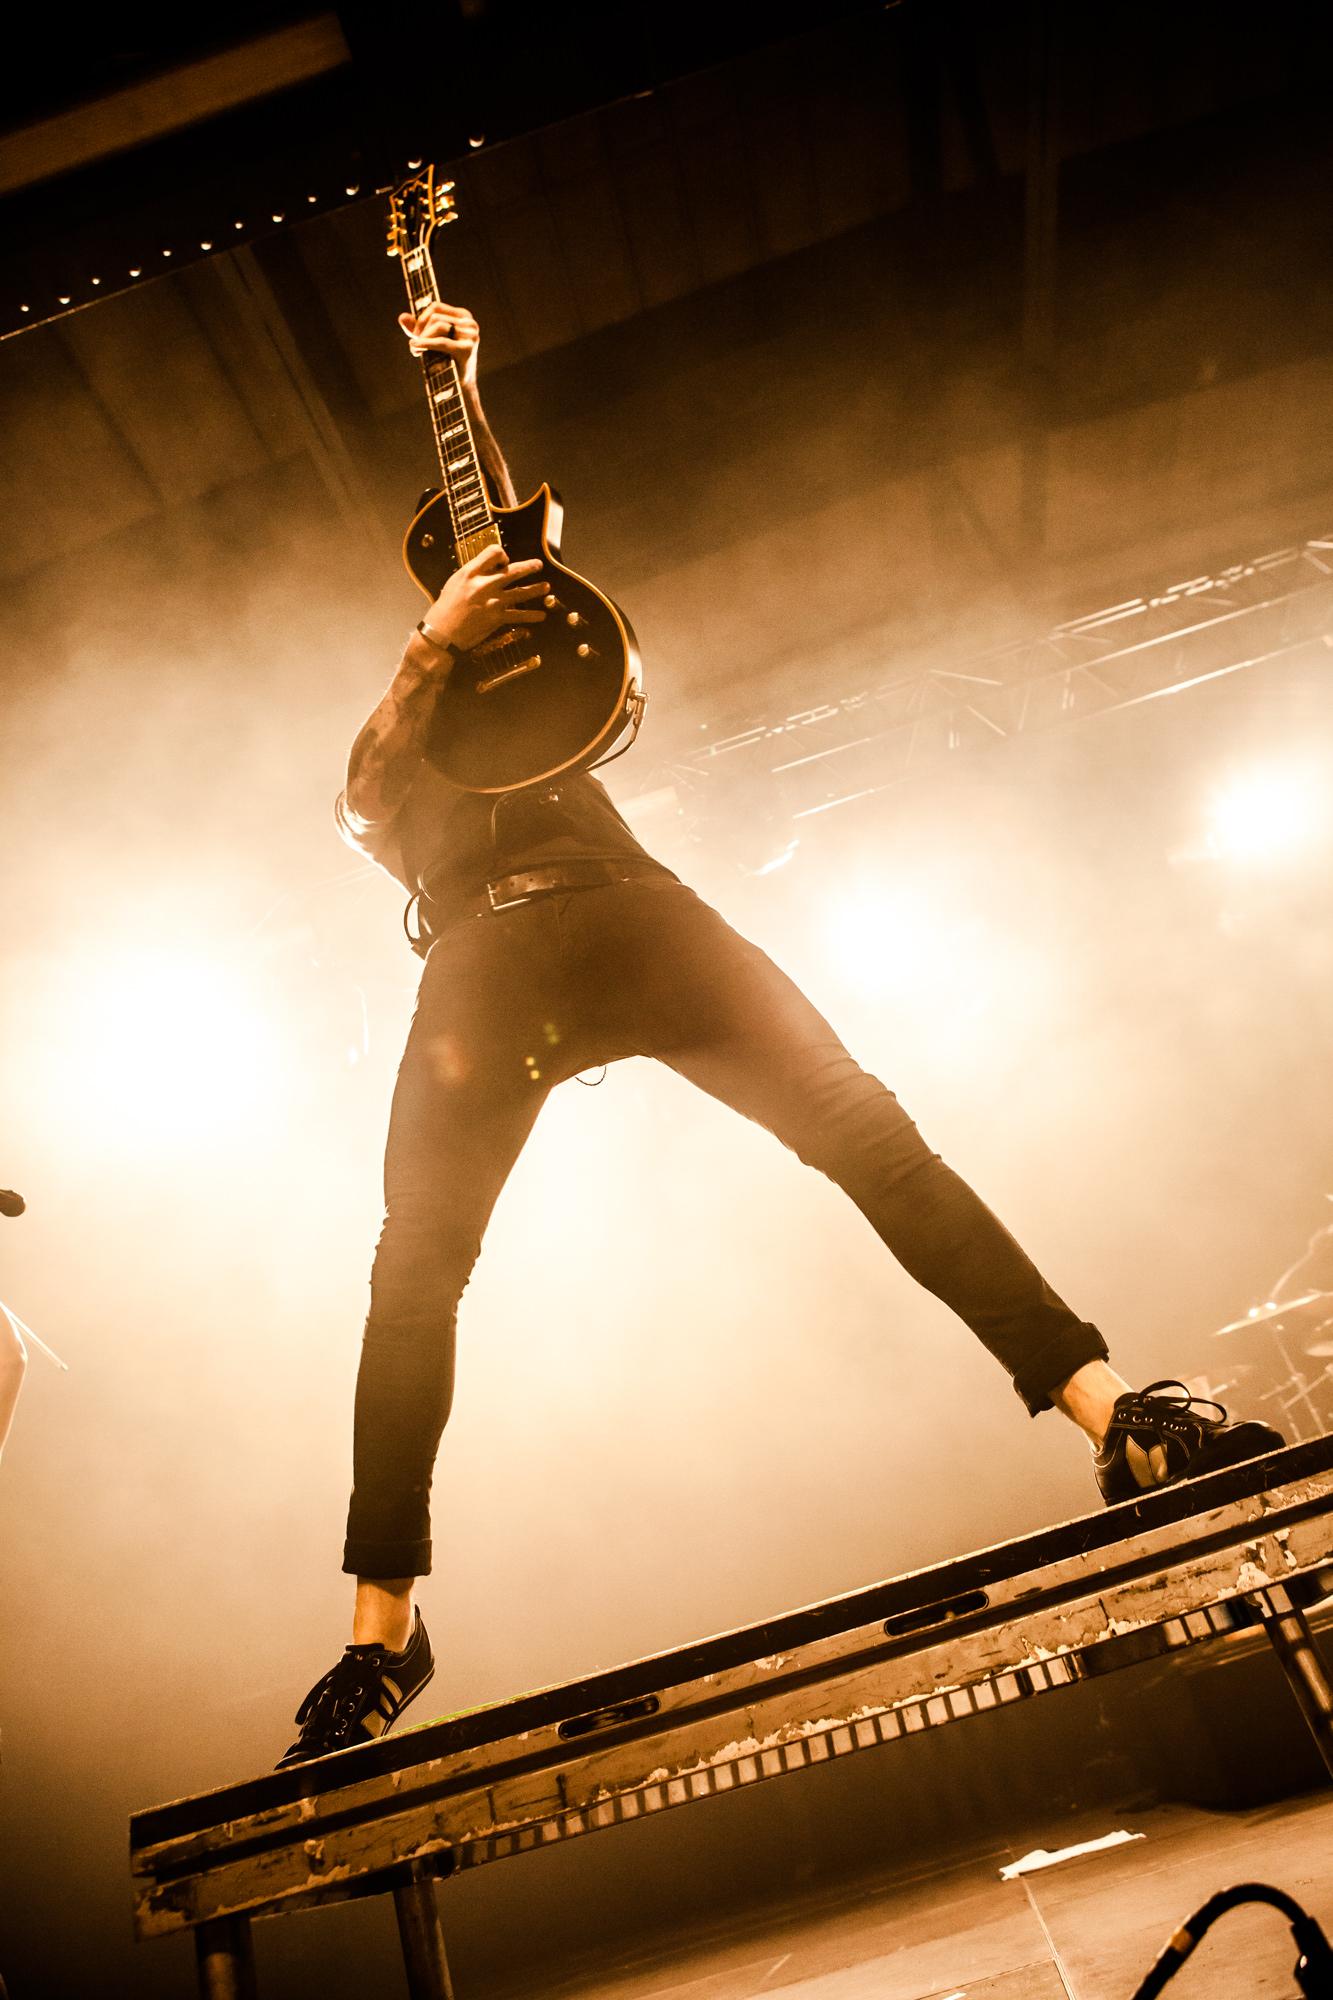 yellowcard-festival-concert-event-music-photography.jpg